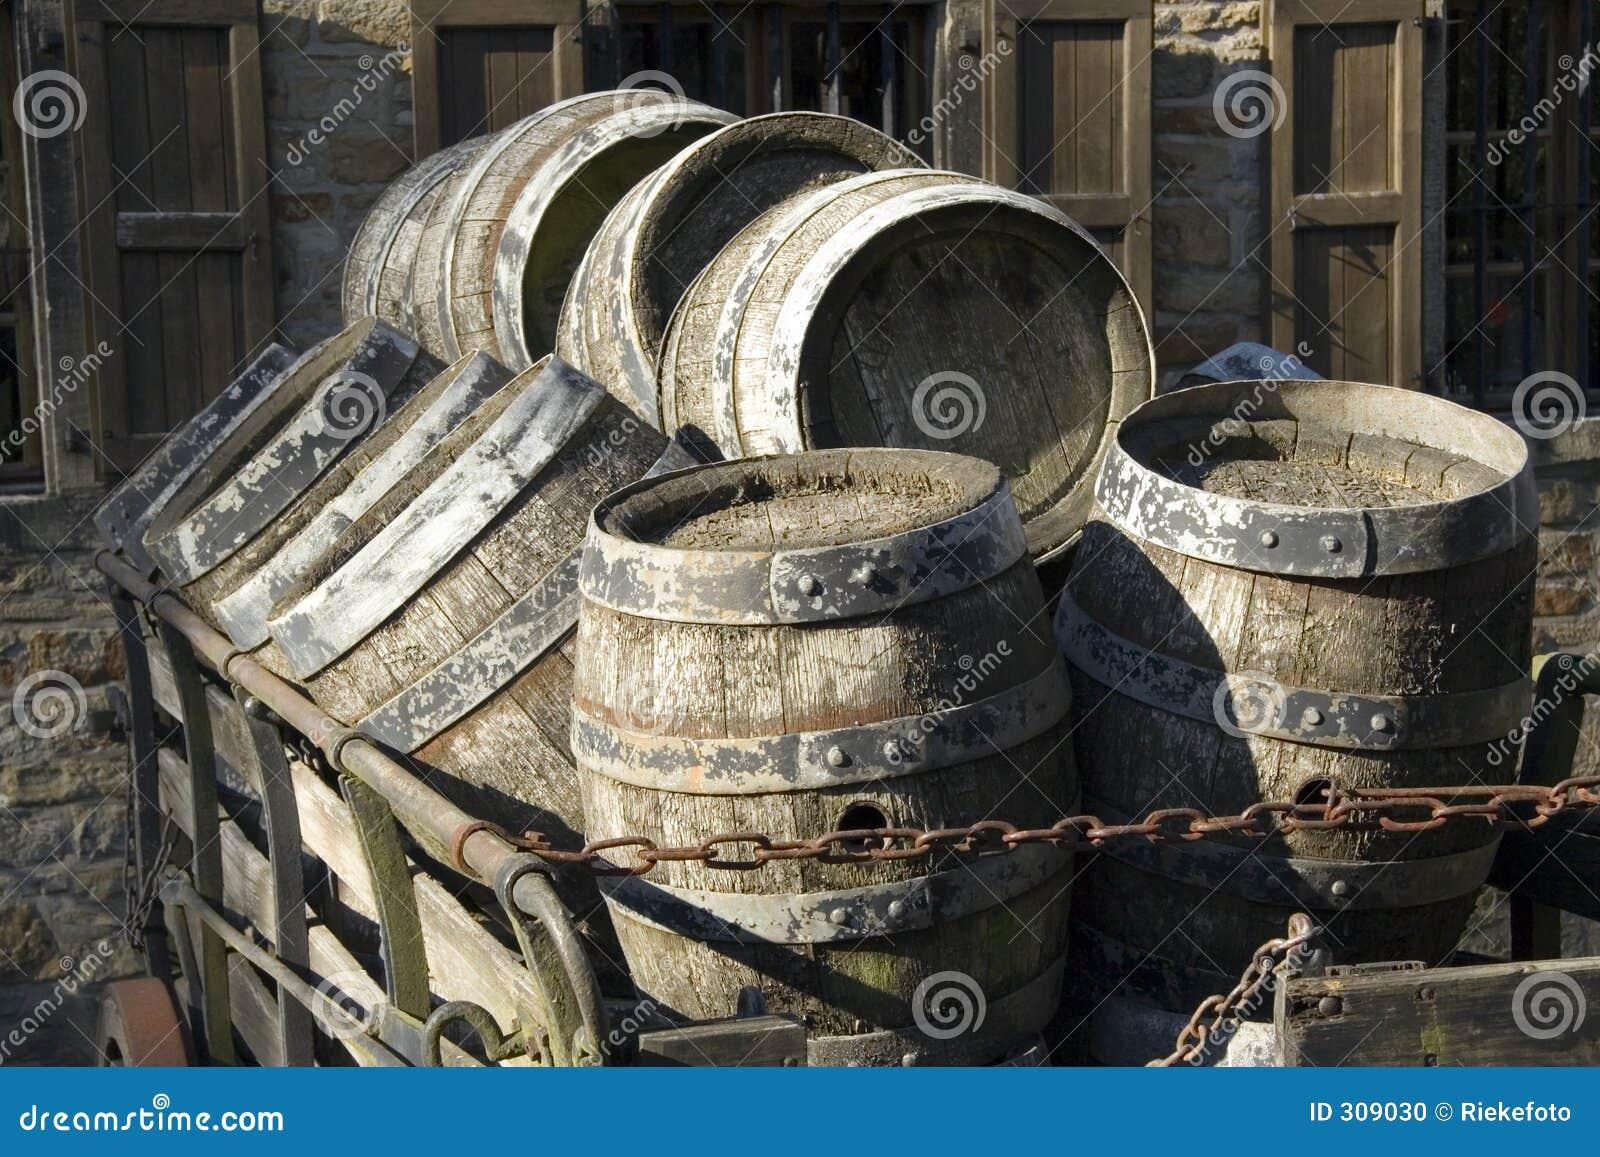 Barriles de cerveza antiguos